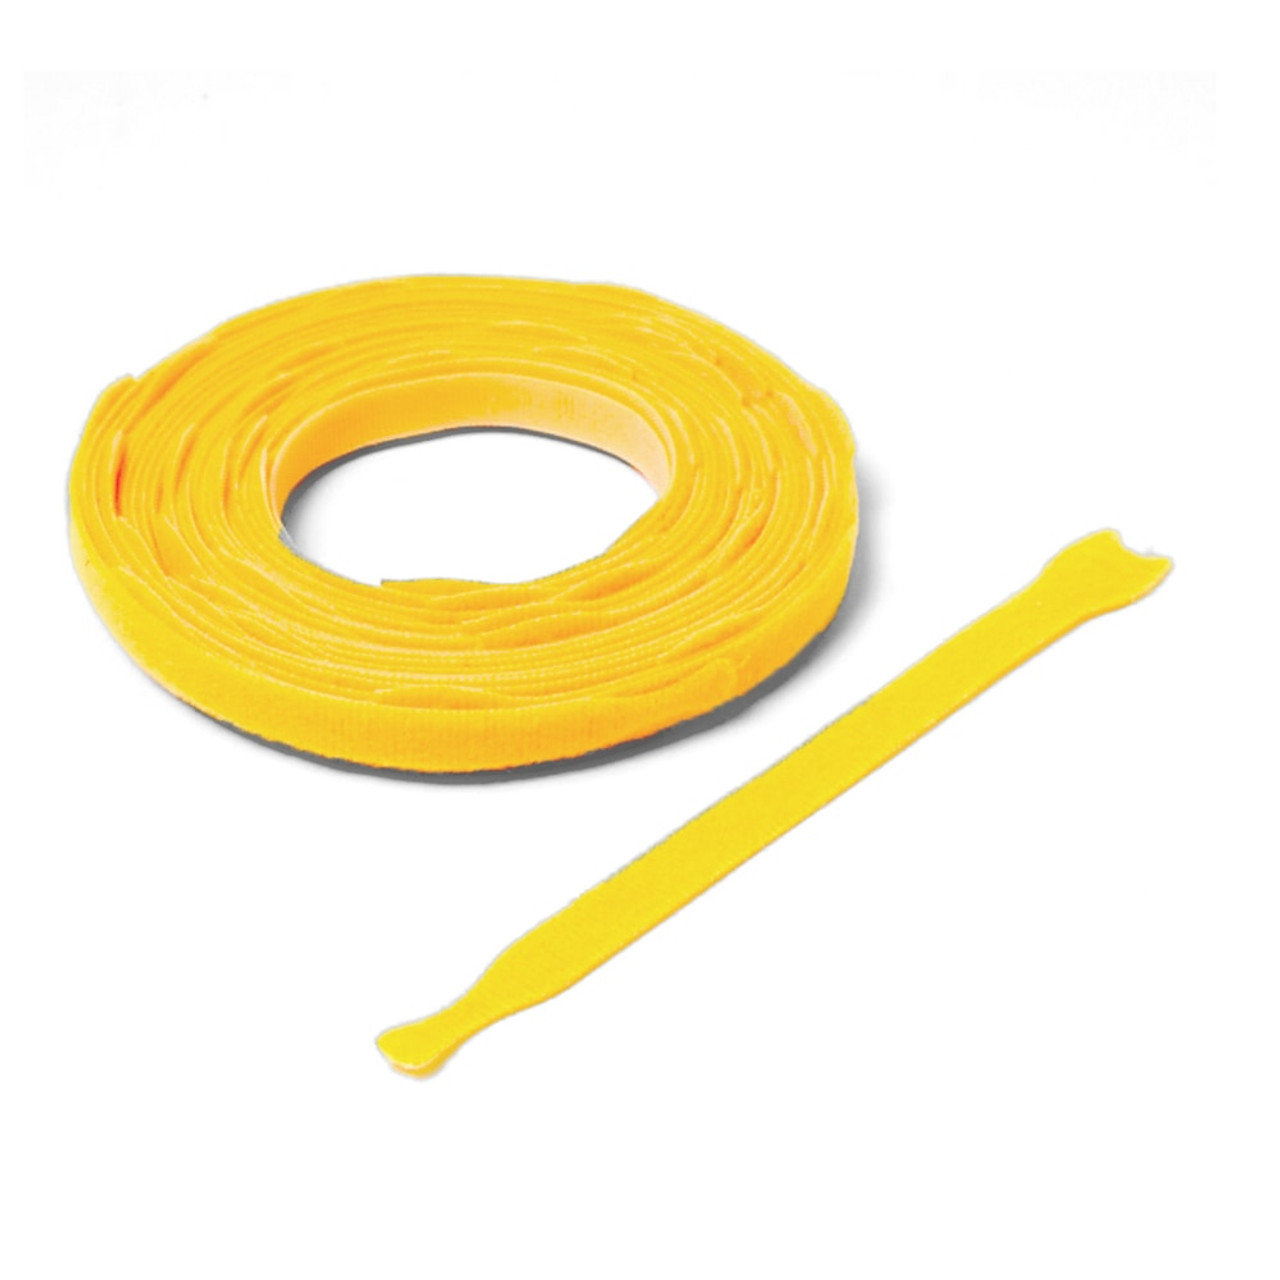 VELCRO ® Brand ONE-WRAP ® Die-Cut Straps - Yellow / Velcro Straps - Bundling Straps - Velcro Tie - Velcro Strap